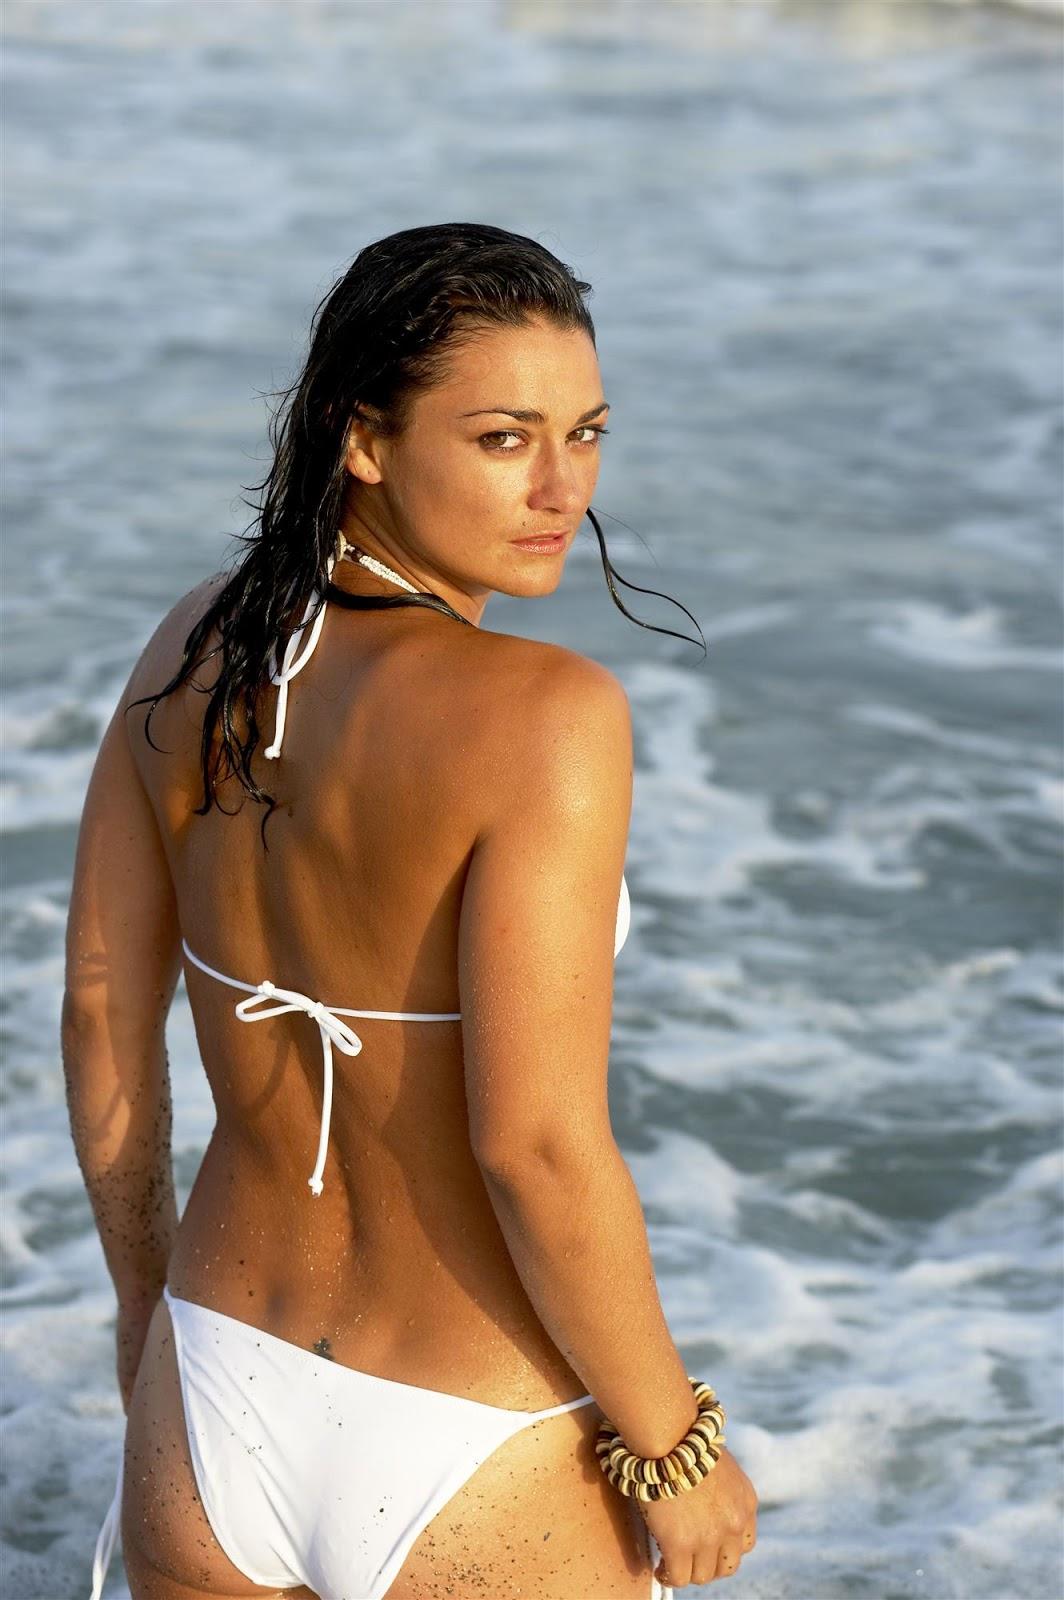 Natalie robb covered topless unknown bikini beach photoshoot